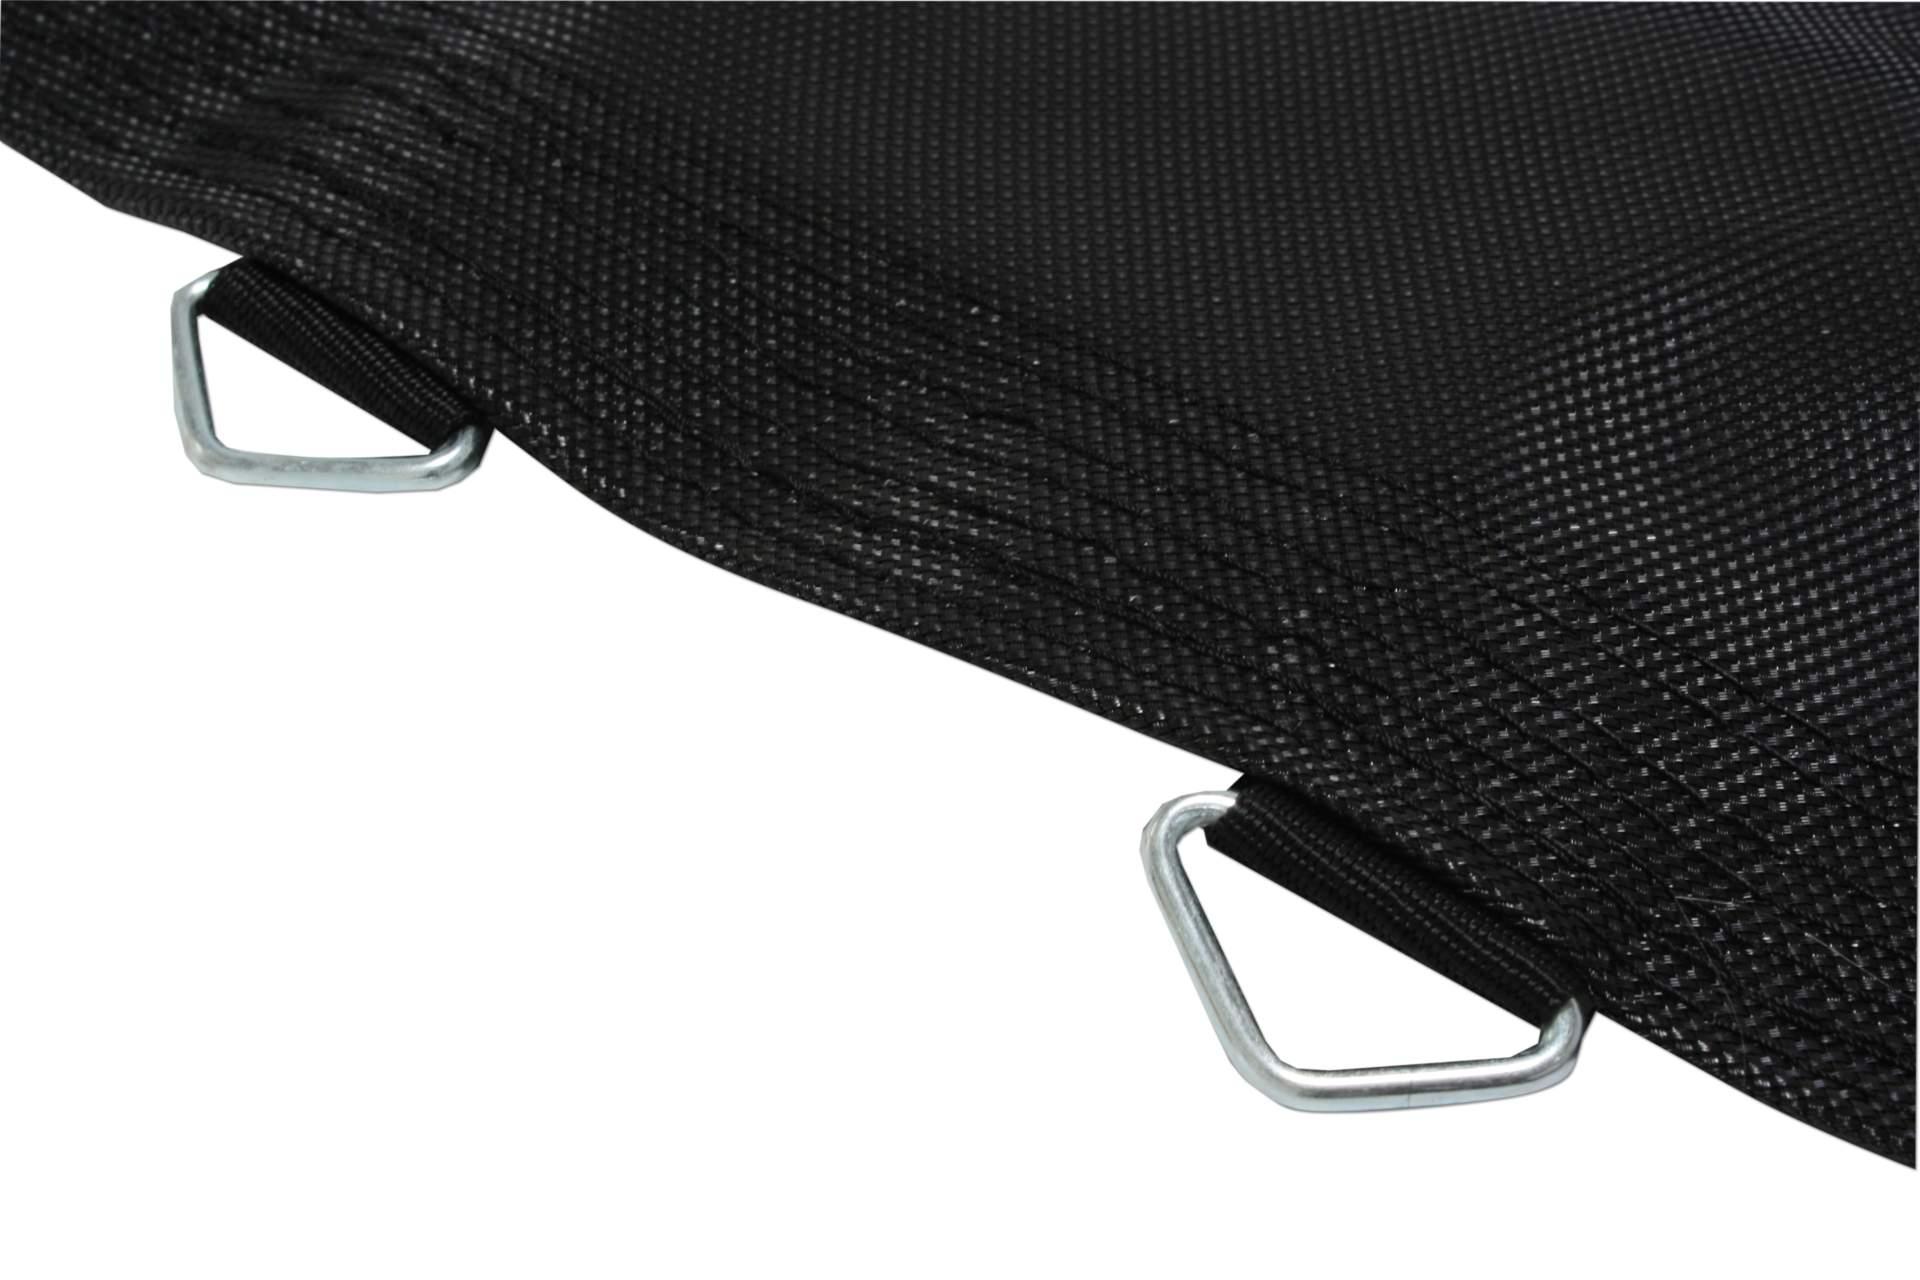 trampolin sprungtuch 250 cm 8 ft f r 48 sen sprung tuch matte sprungmatte neu ebay. Black Bedroom Furniture Sets. Home Design Ideas